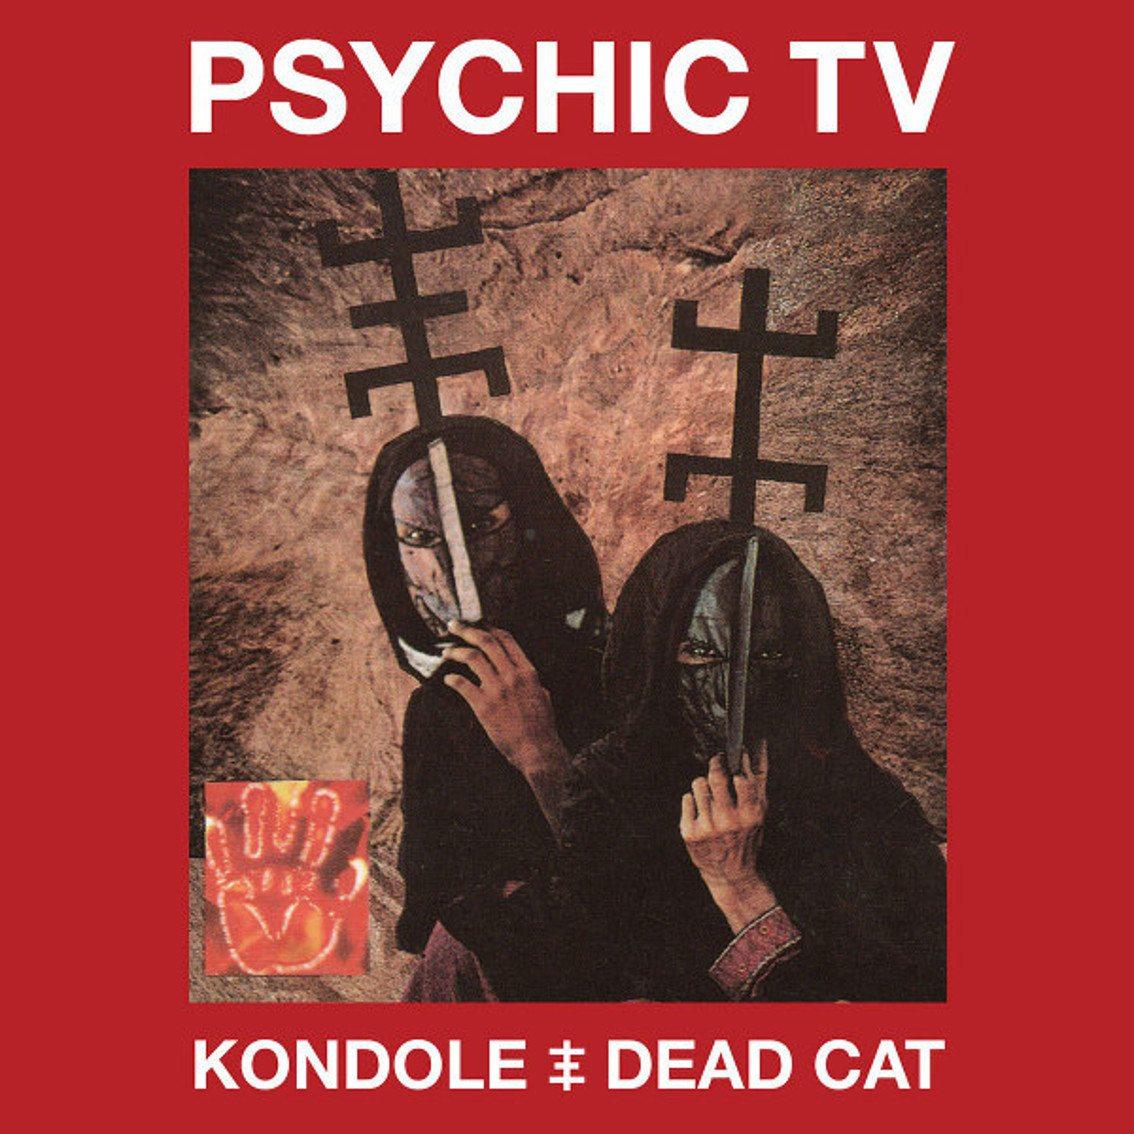 Psychic TV to release'Kondole' 2CD+DVD set